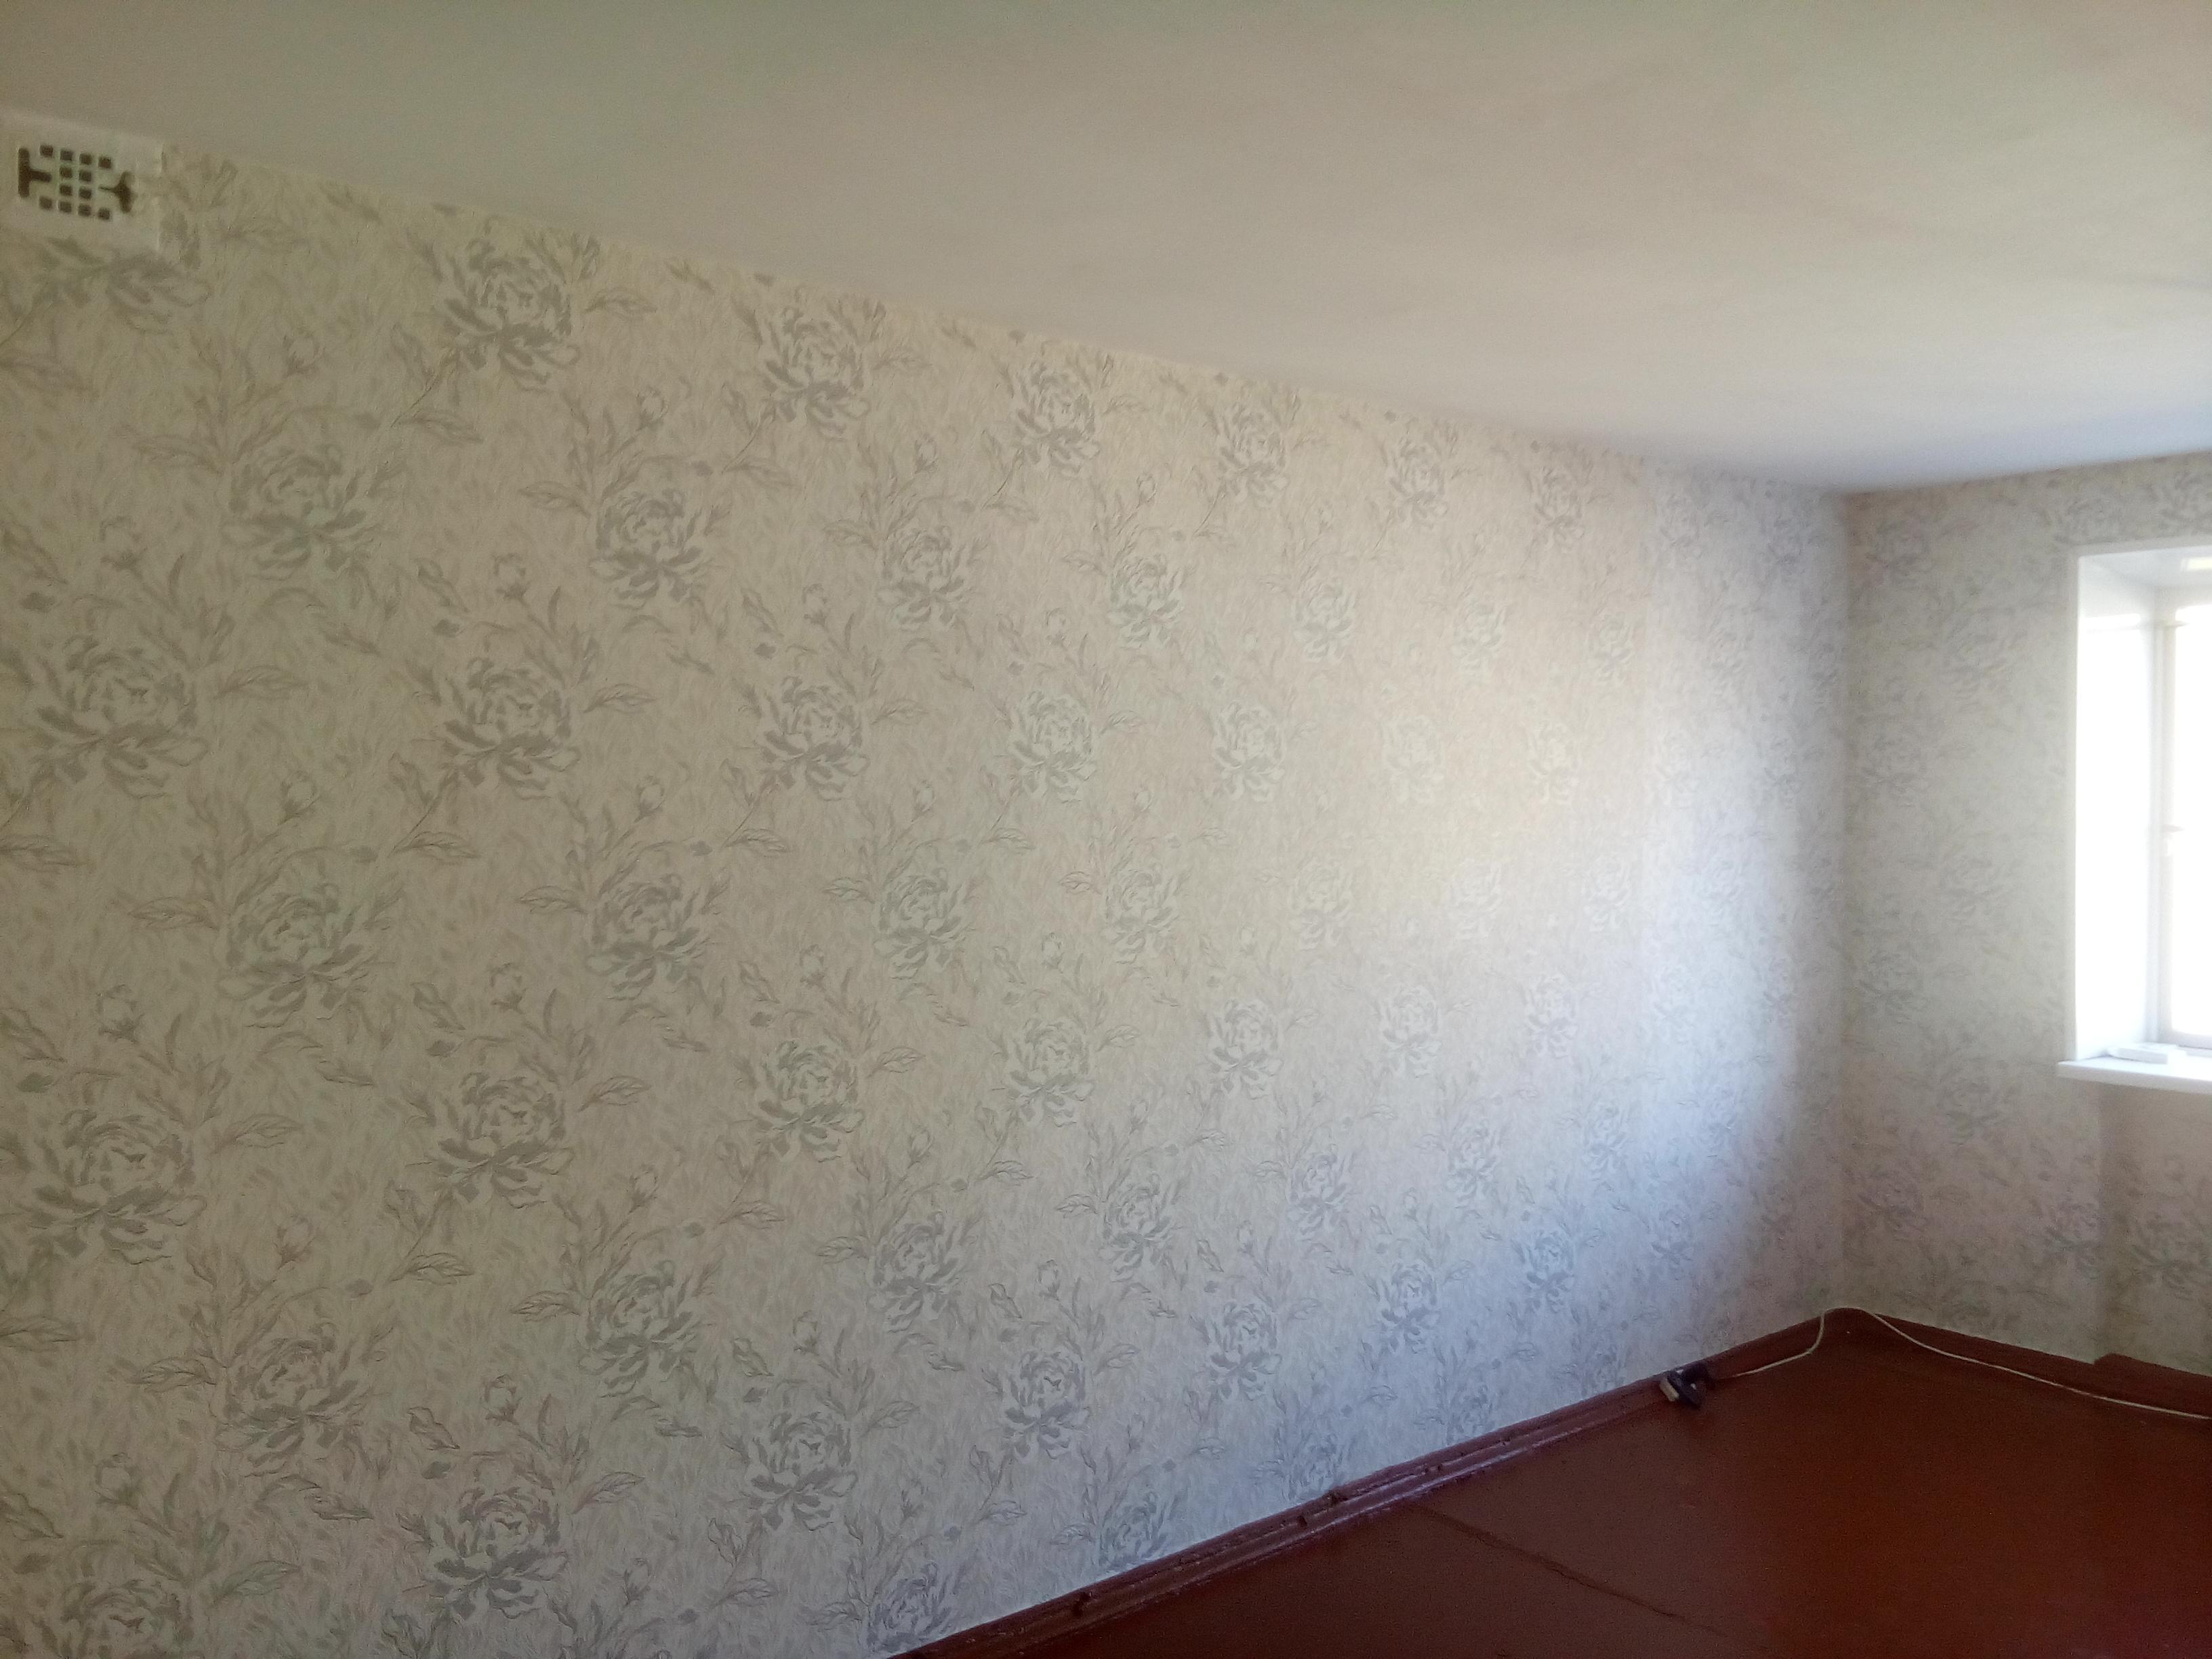 Комната 17,3 кв.м. - ул. Конная, д. 28